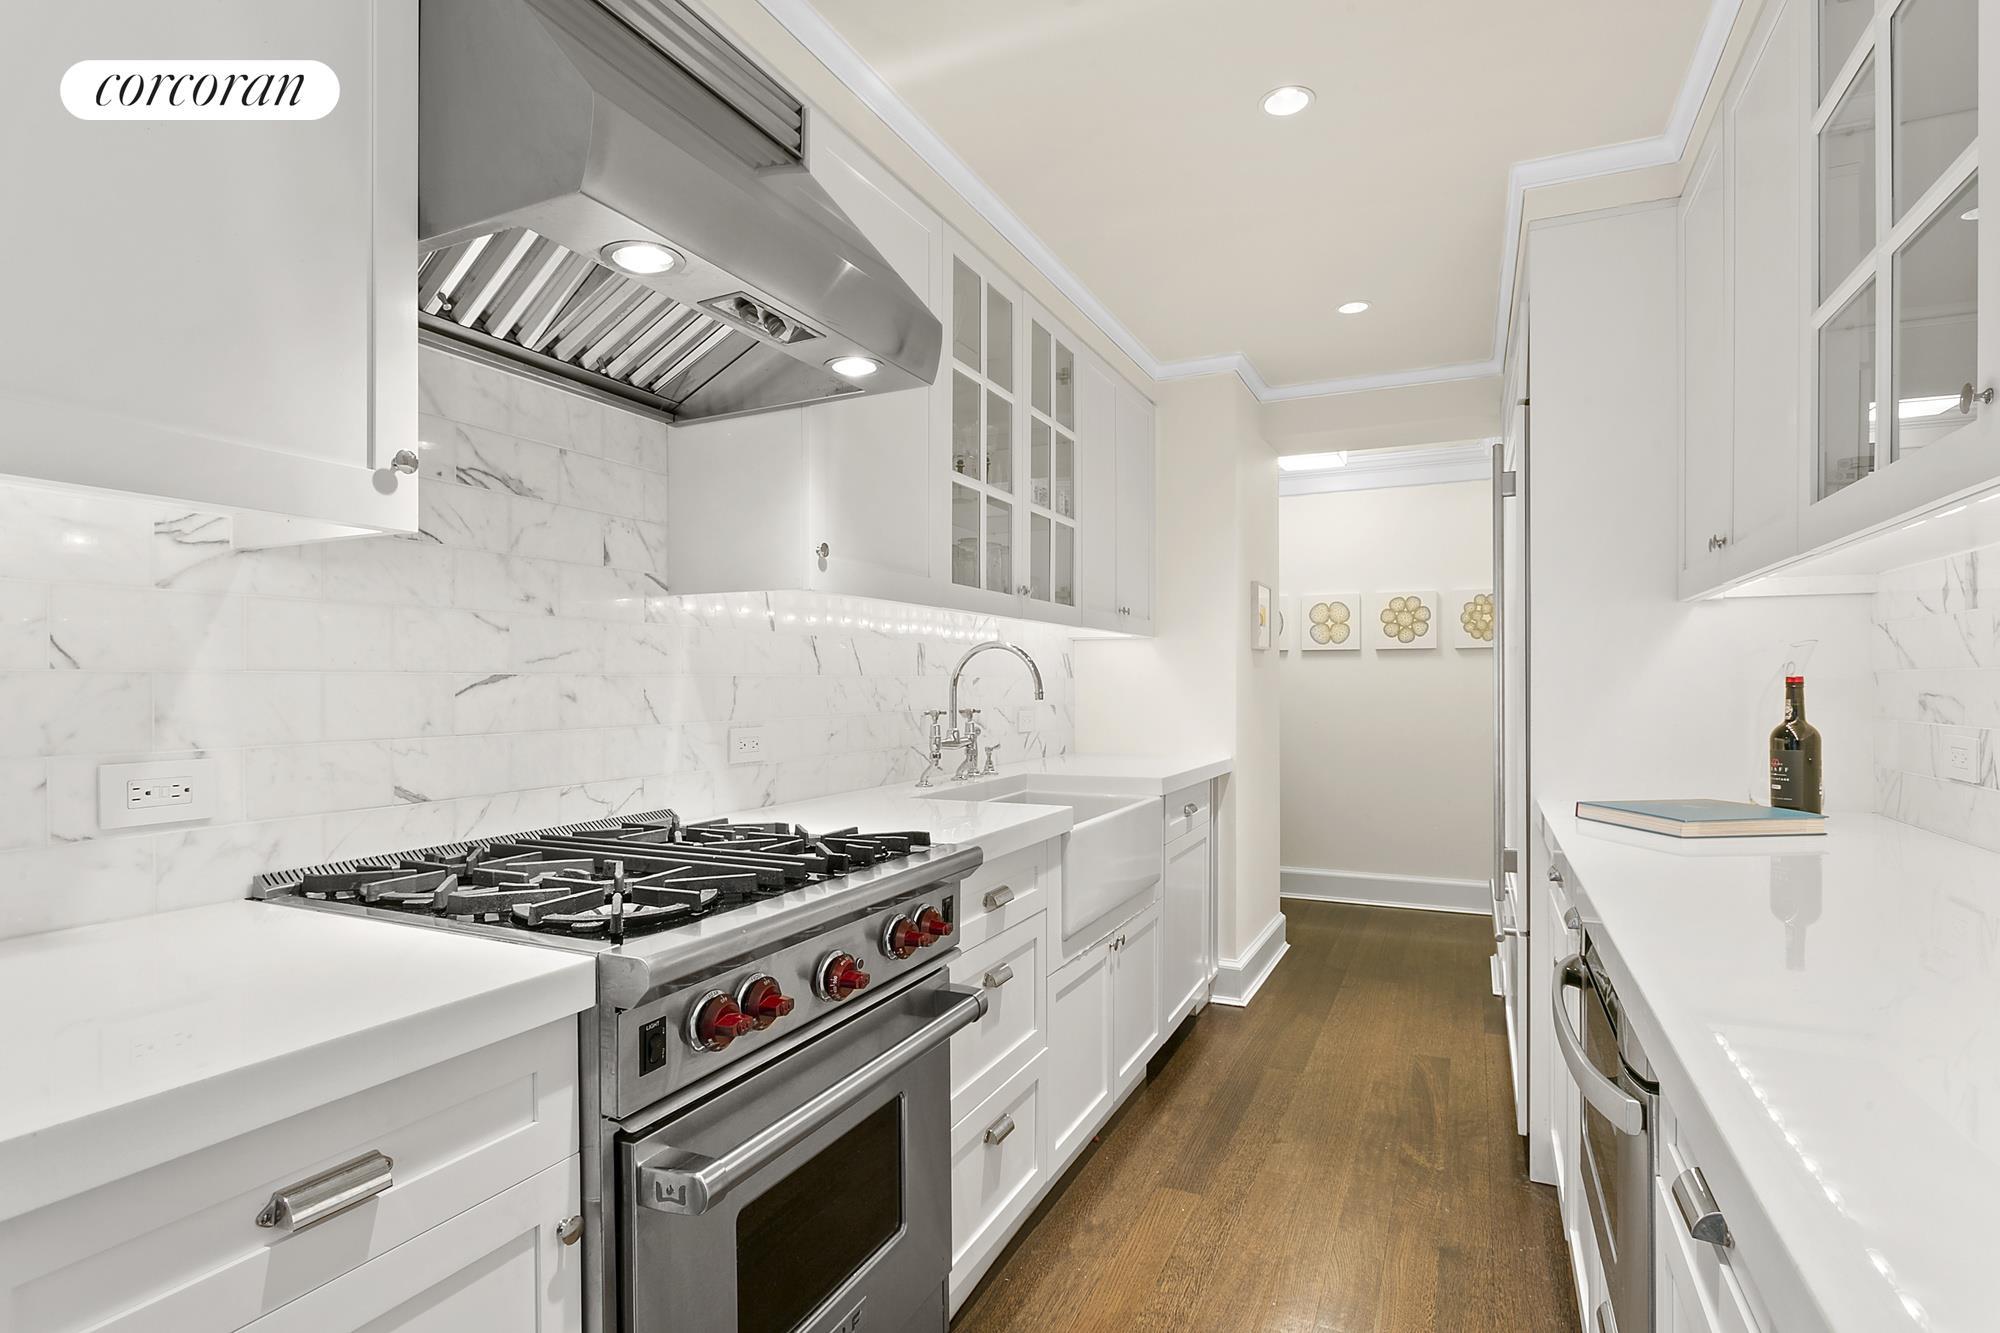 Corcoran, 28 East 10th Street, Apt. 4A, Greenwich Village Rentals ...